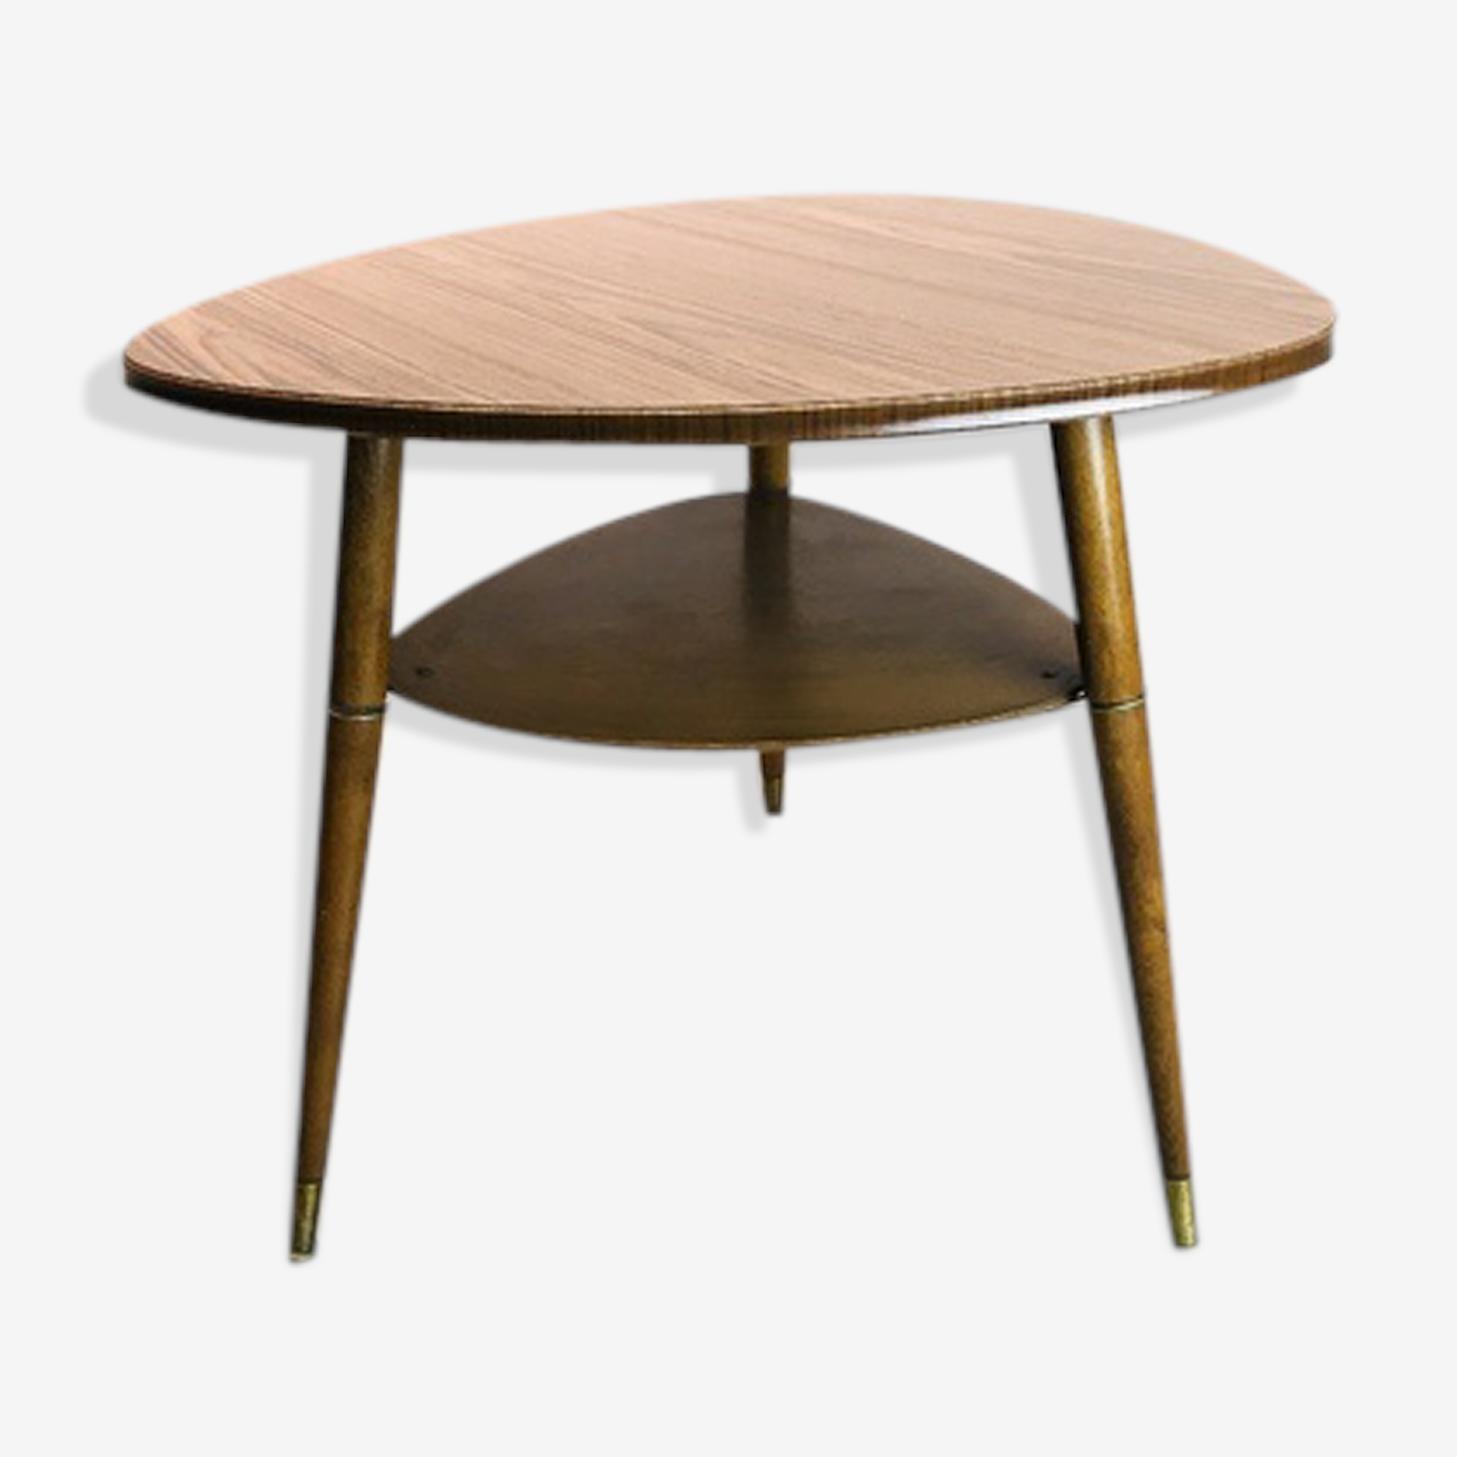 Table tripode années 60